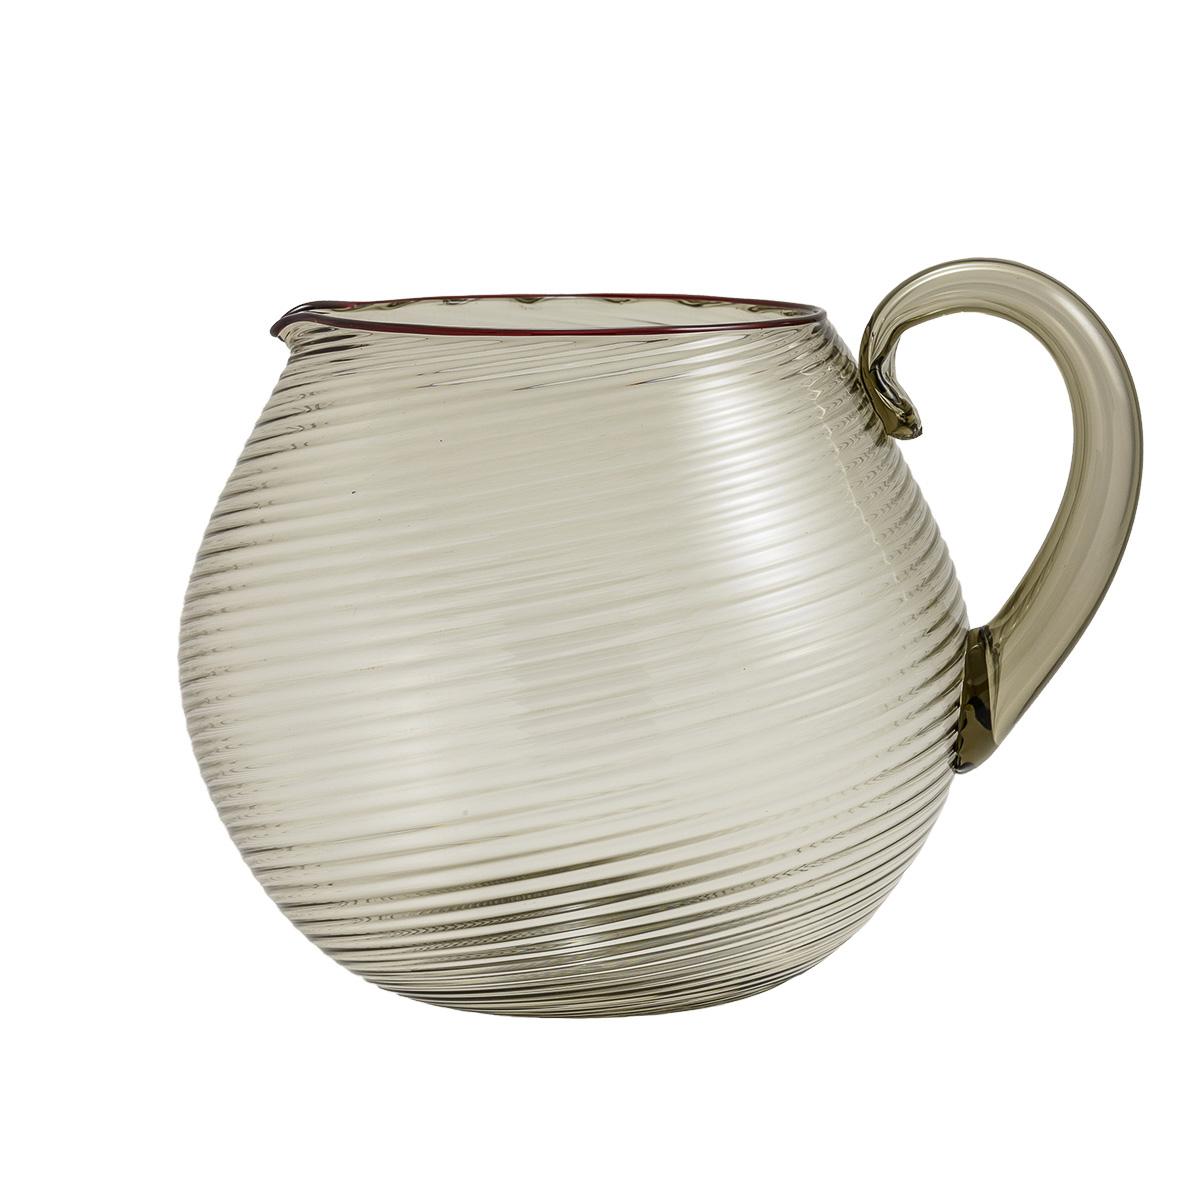 palla-jug-riga-mena-murano-glass-design-giberto-luxury-water-modern